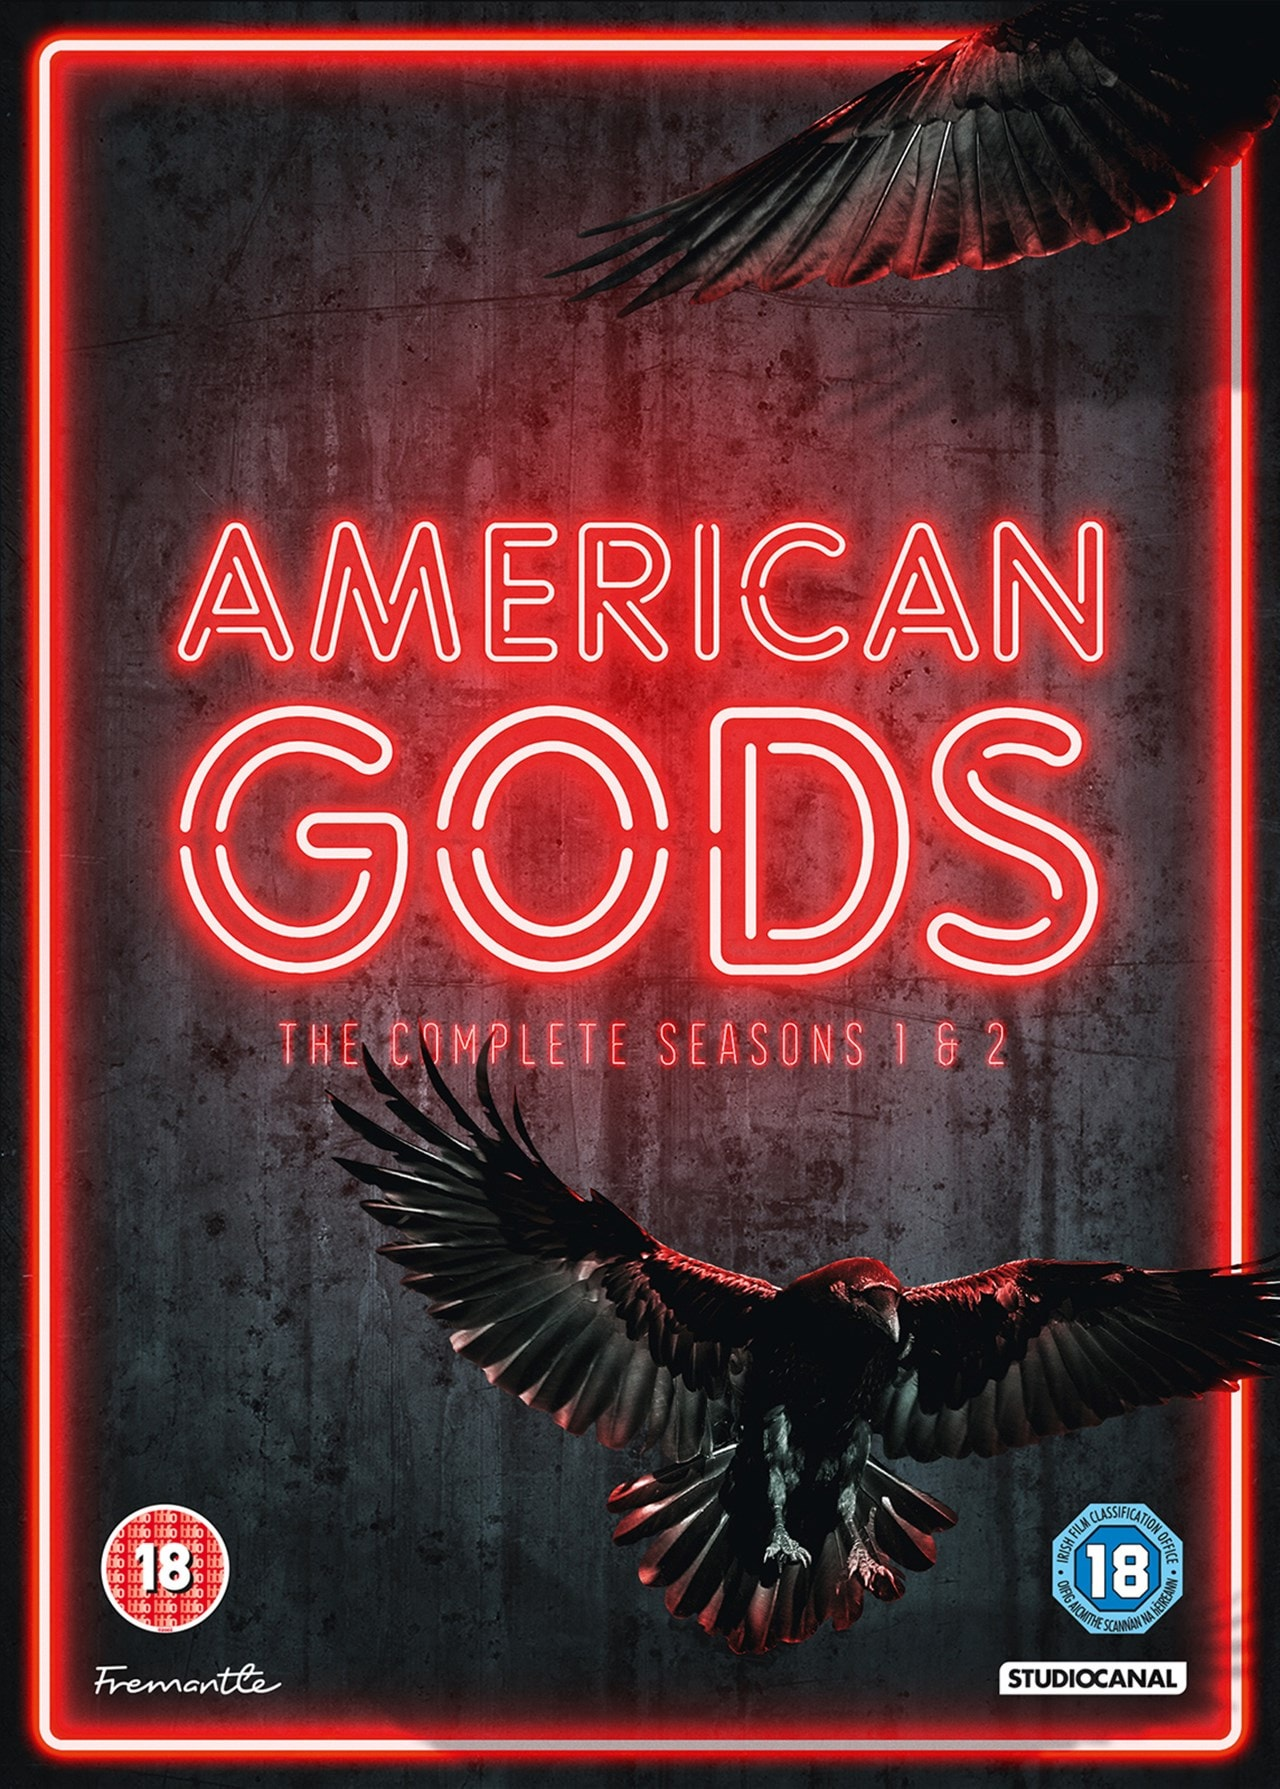 American Gods: The Complete Seasons 1 & 2 - 1